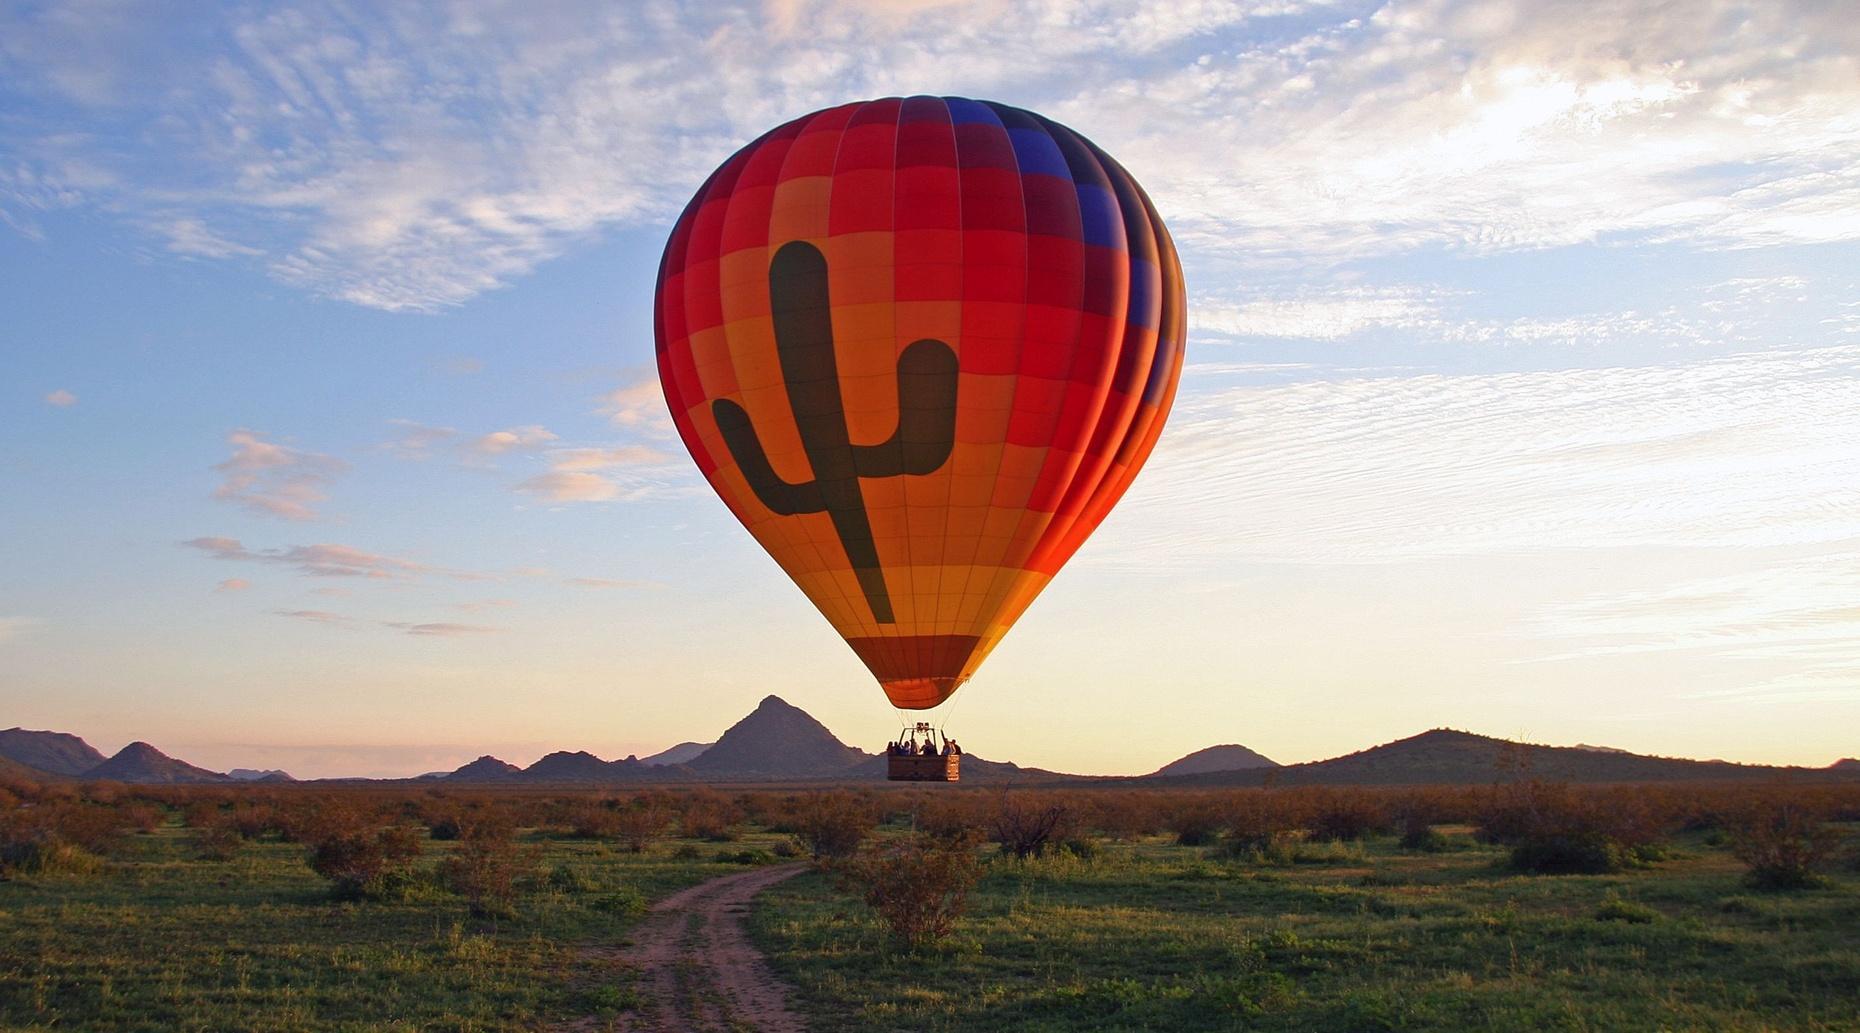 Morning Hot Air Balloon Flight in Phoenix